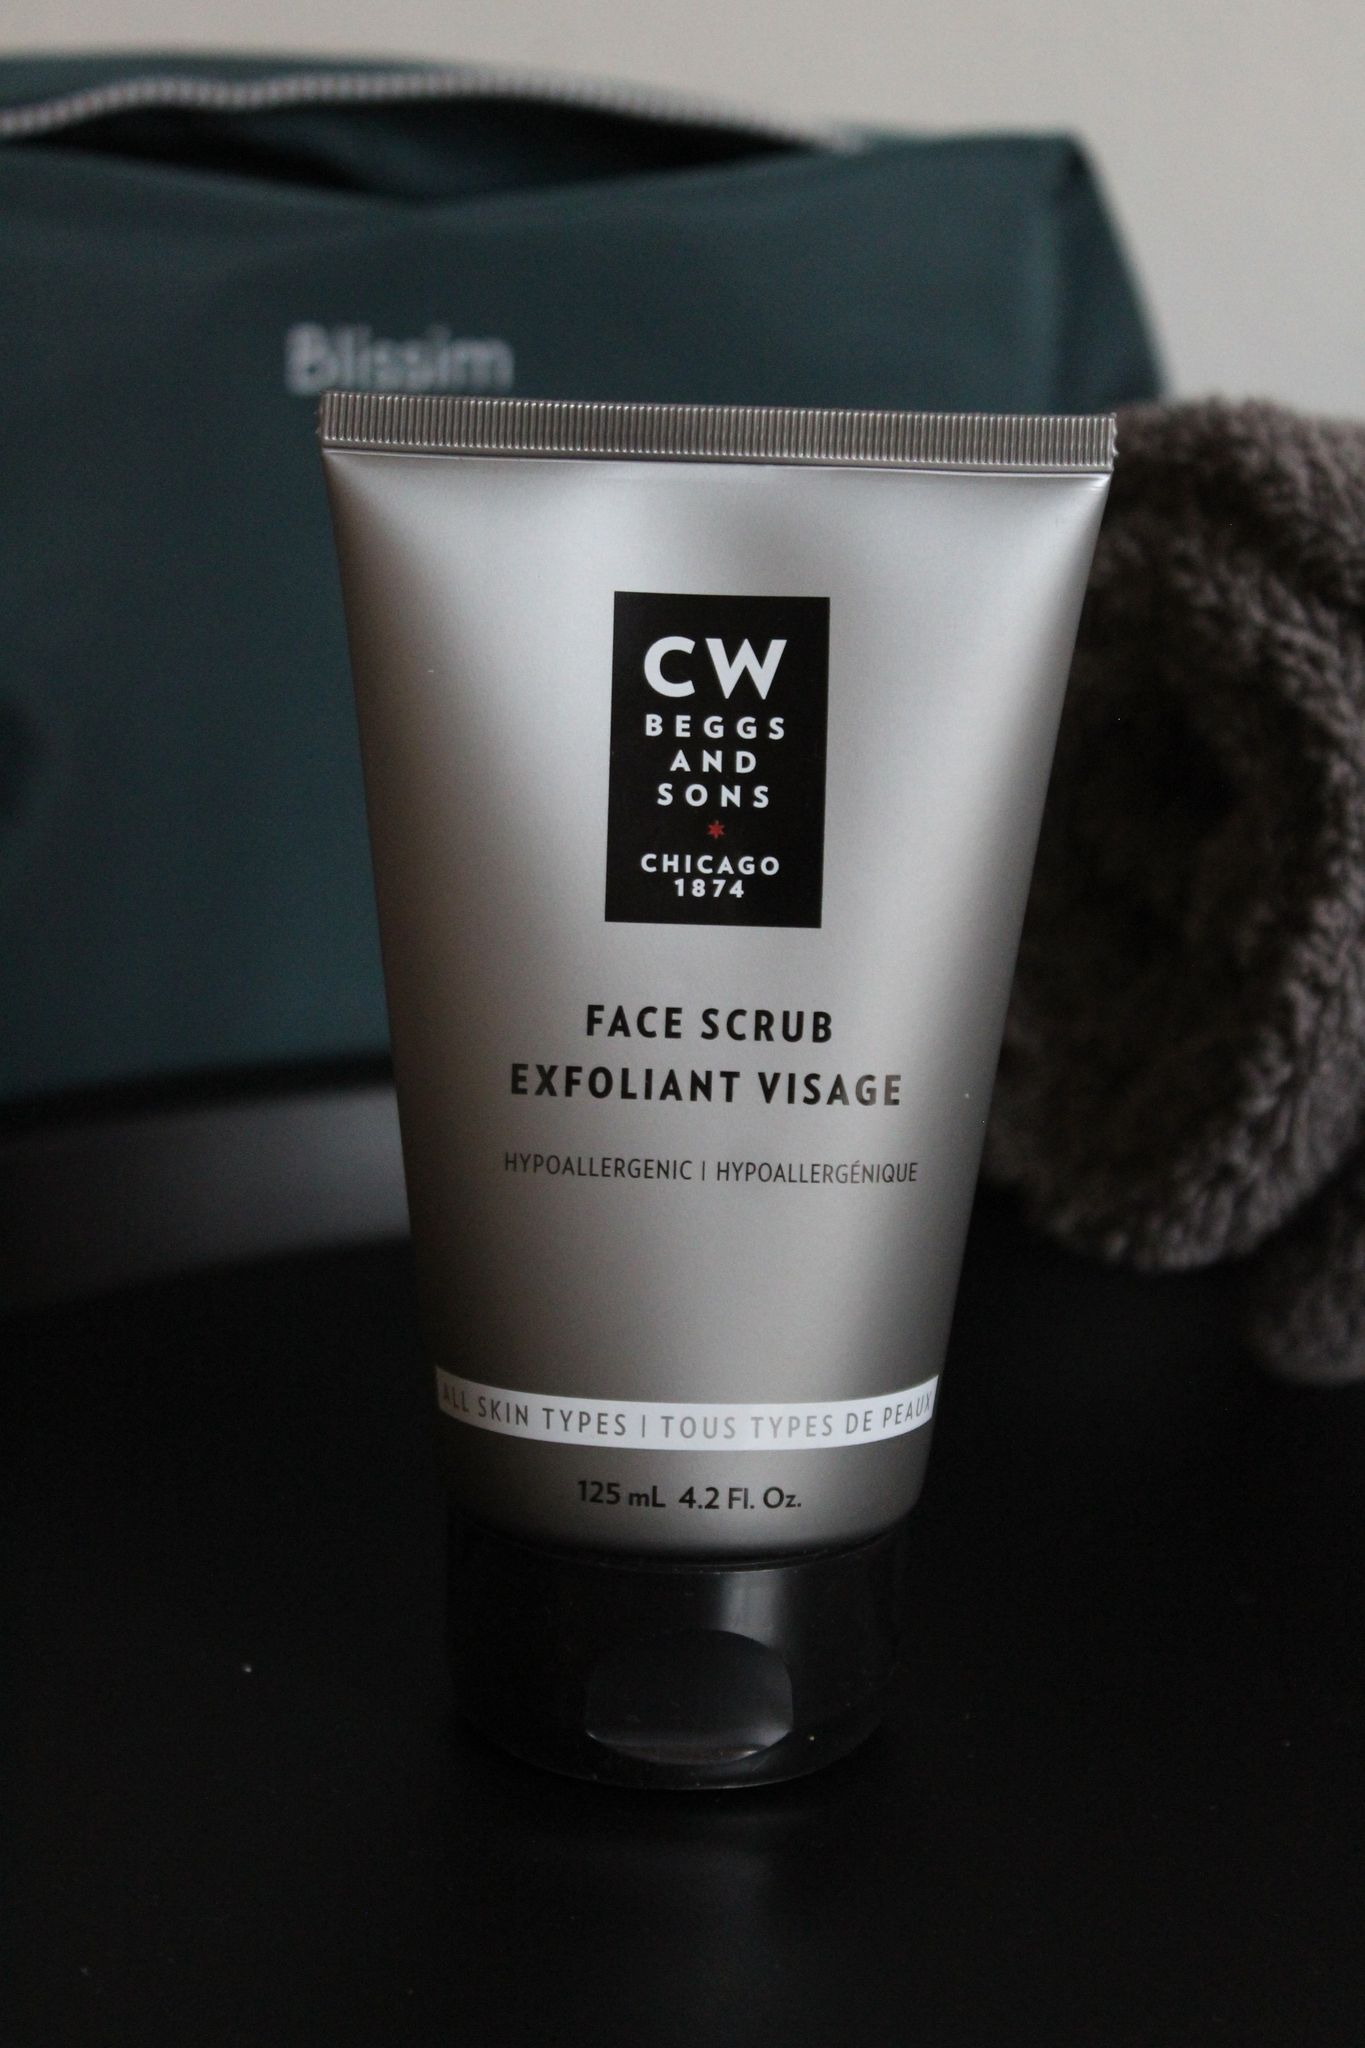 Le soin exfoliant visage de CW Beggs & Son